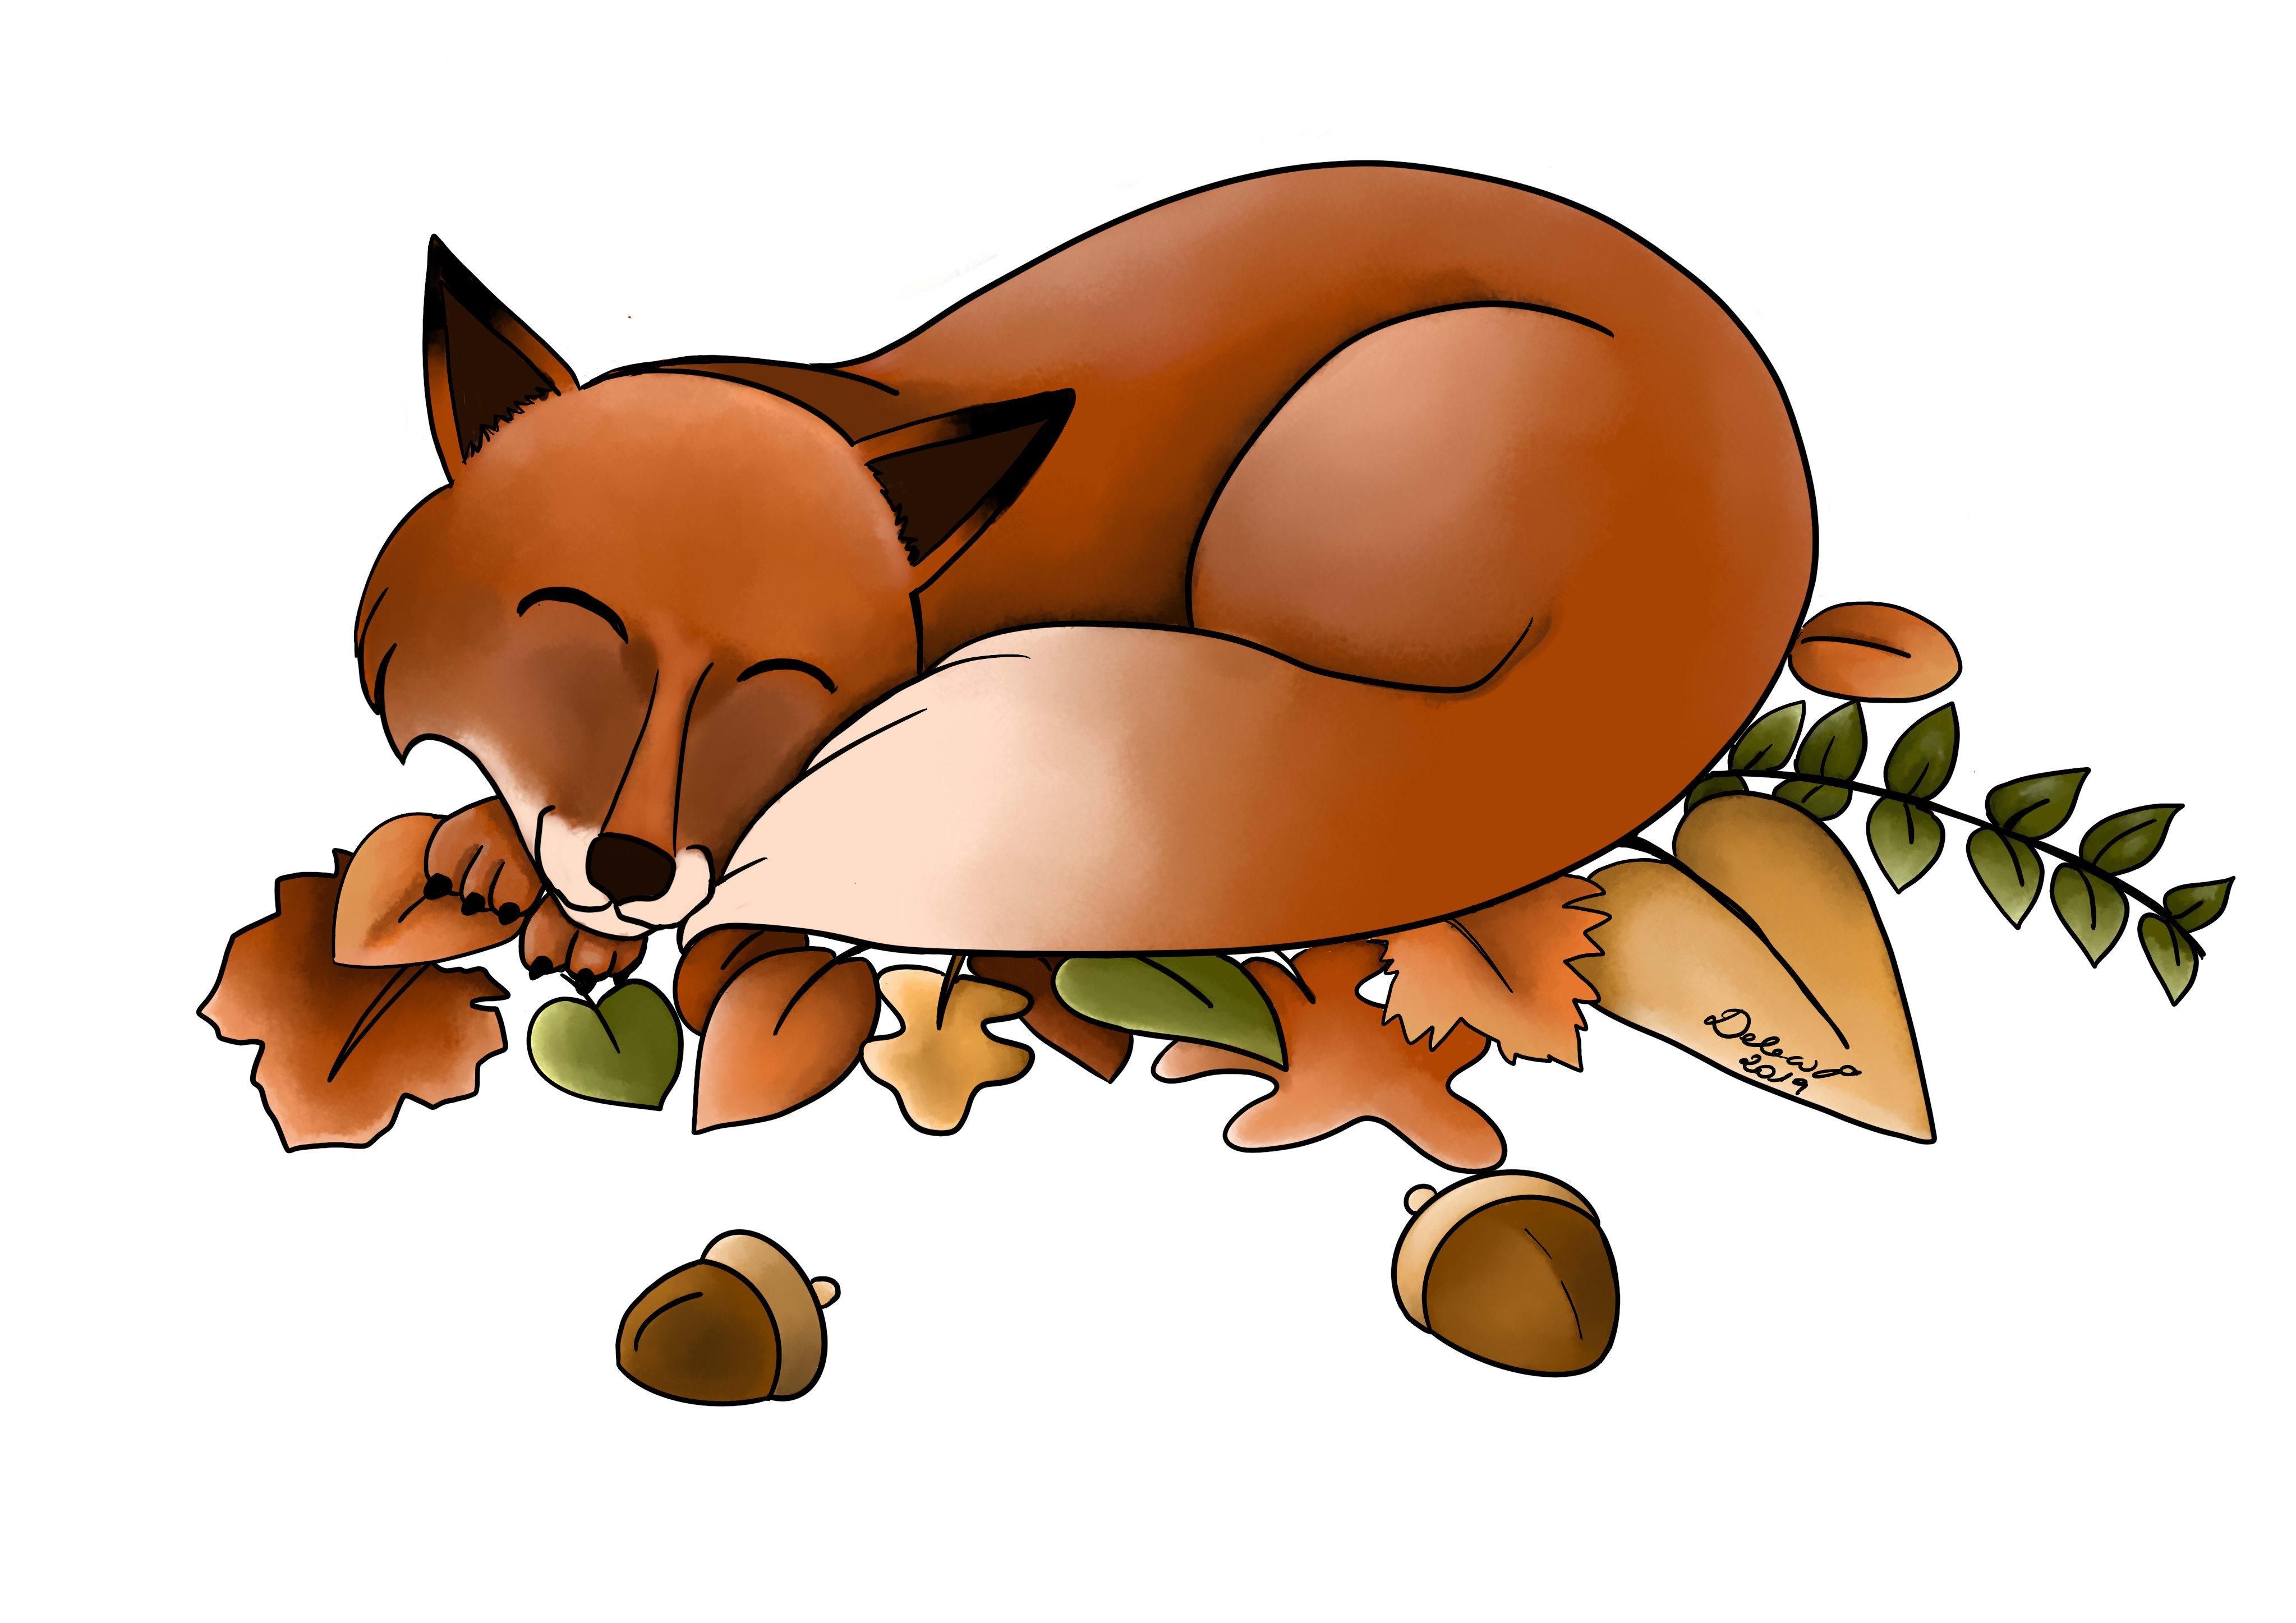 Create A Cute Kawaii Cartoon Animal And Pet Illustration By Bedyperry